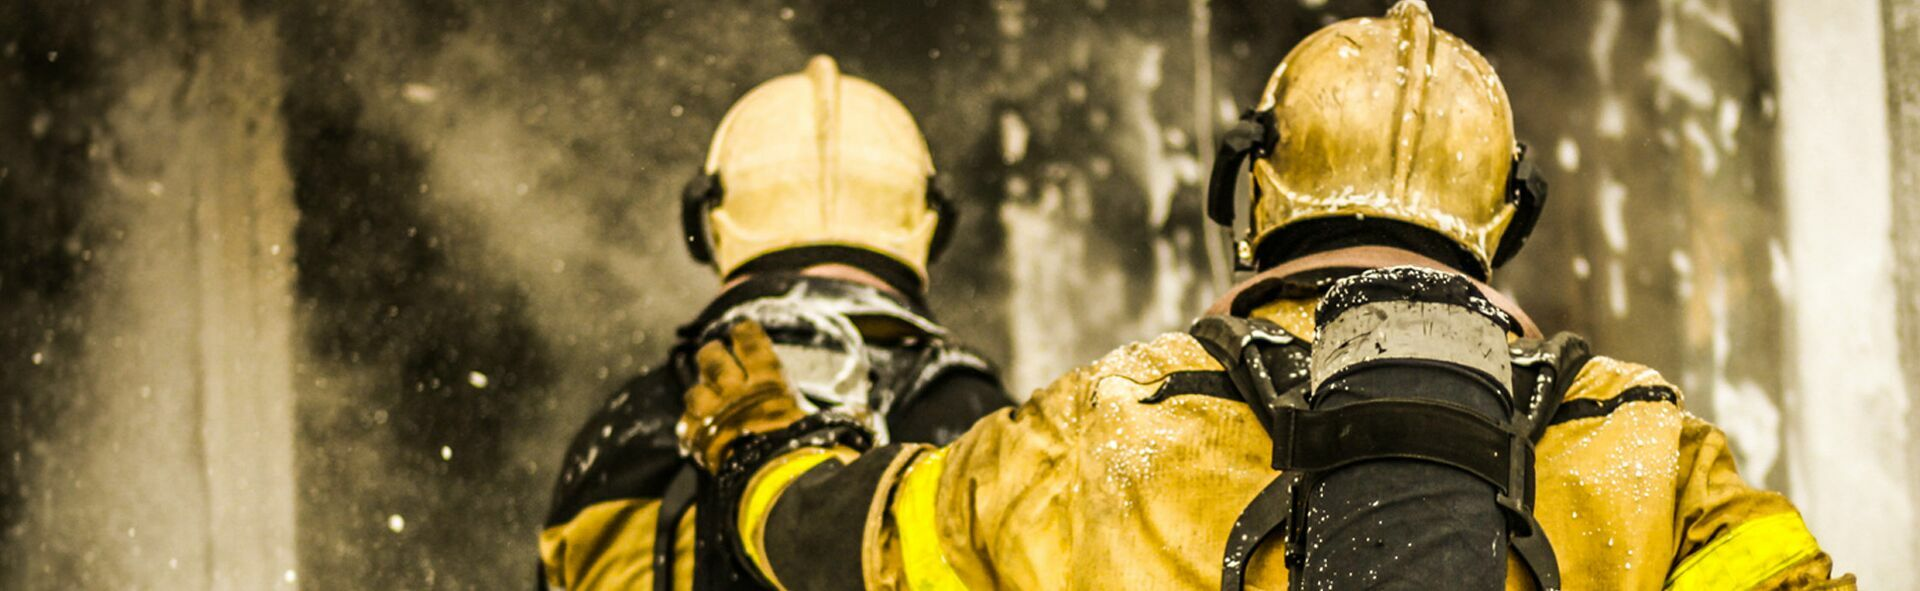 Brandweermann